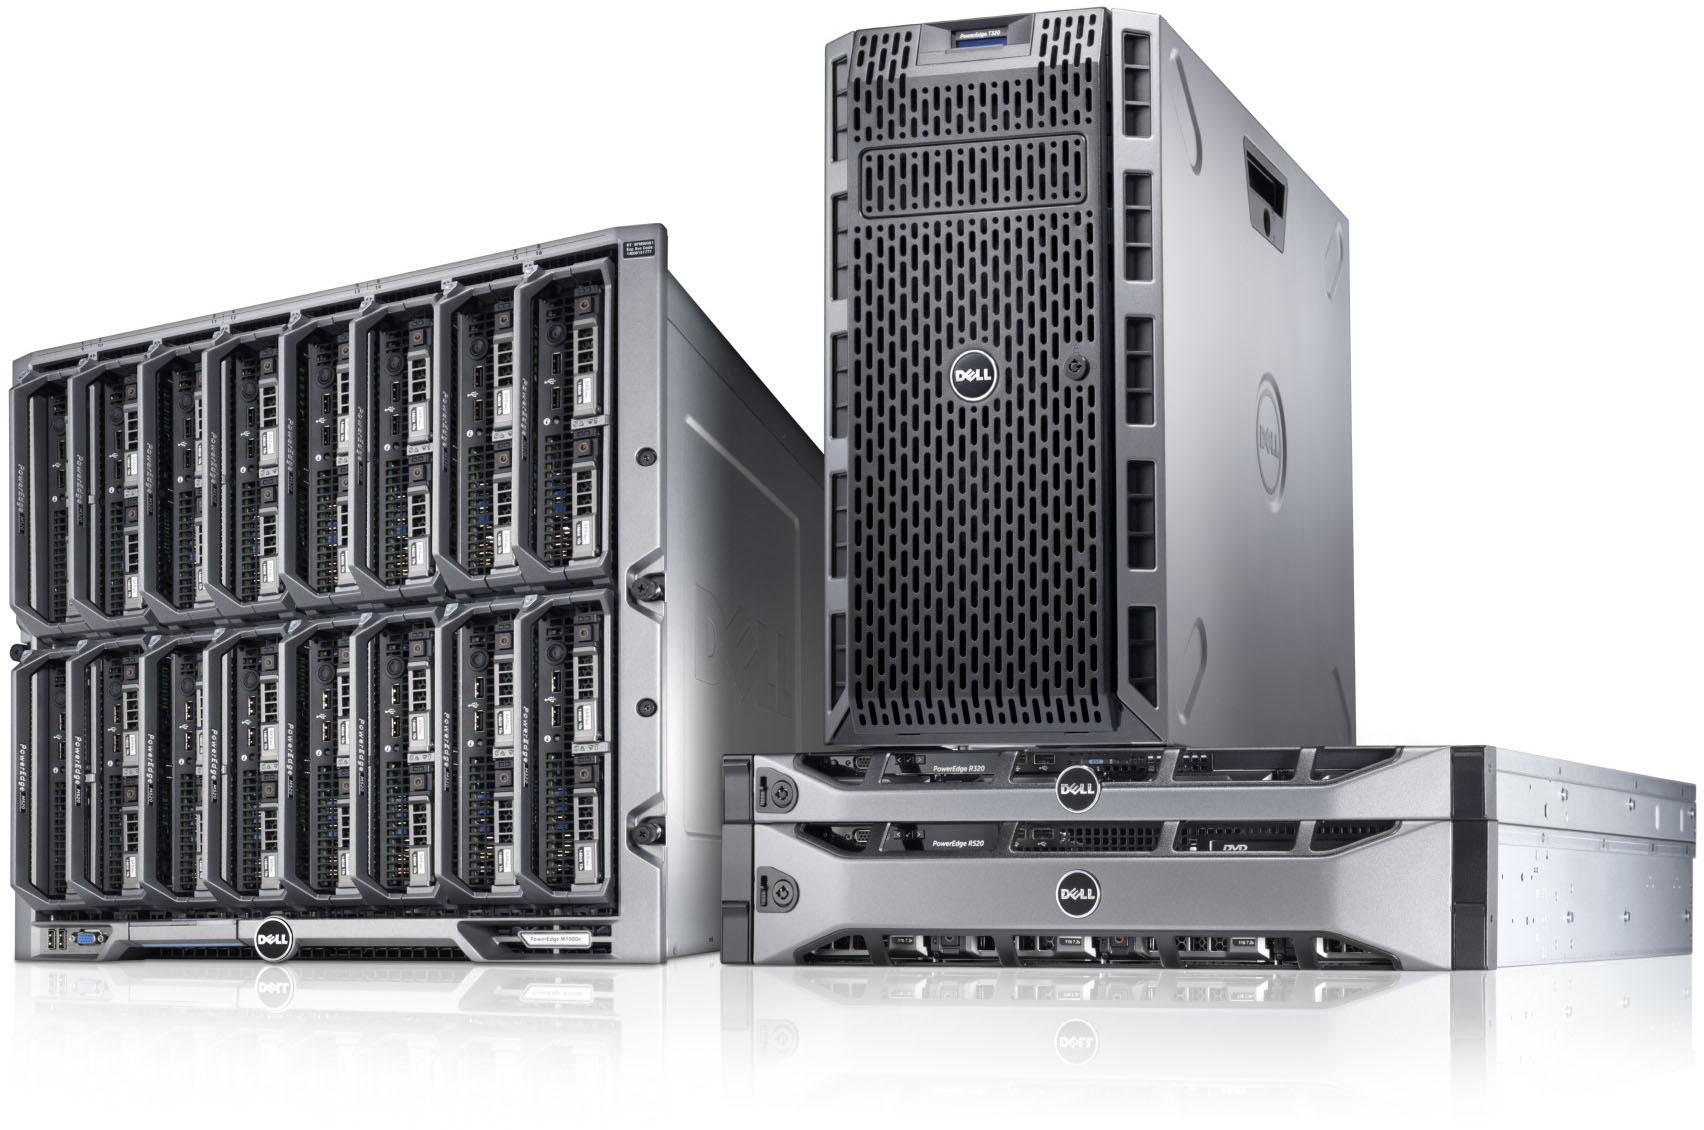 bán máy chủ server